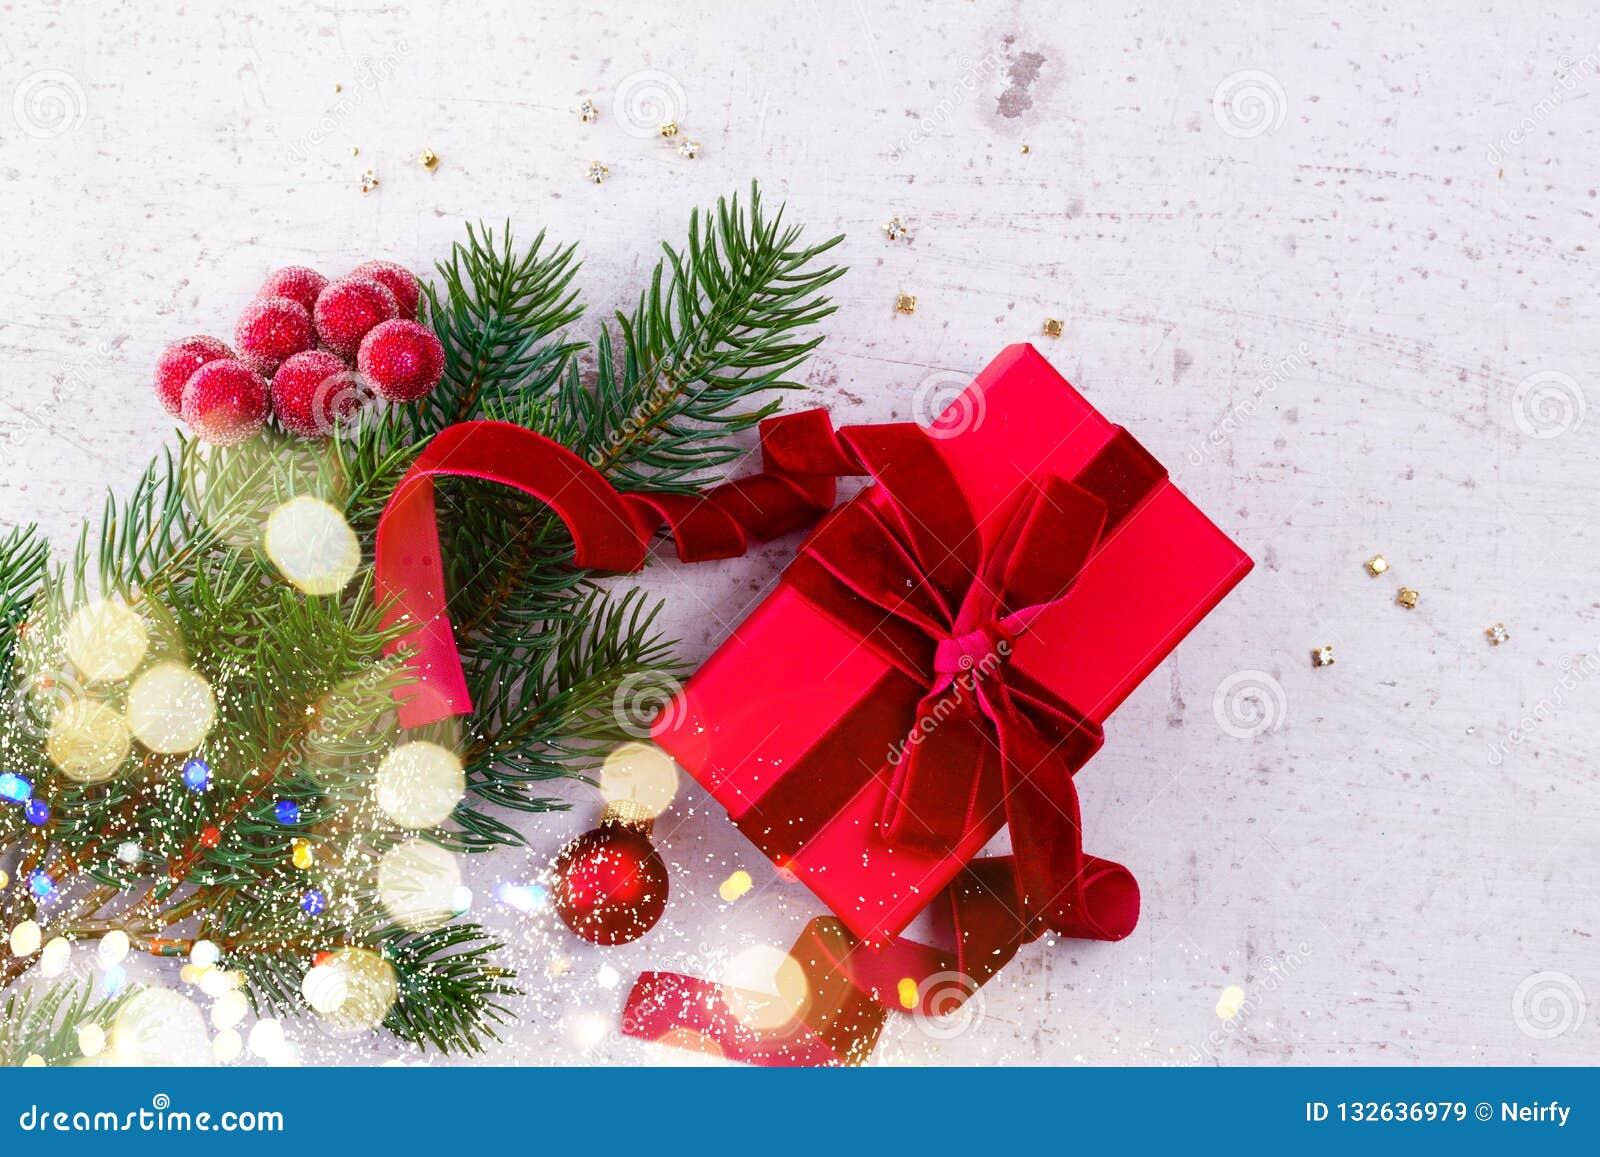 Christmas Gift Giving Images.Christmas Gift Giving Stock Image Image Of Ribbon Greeting